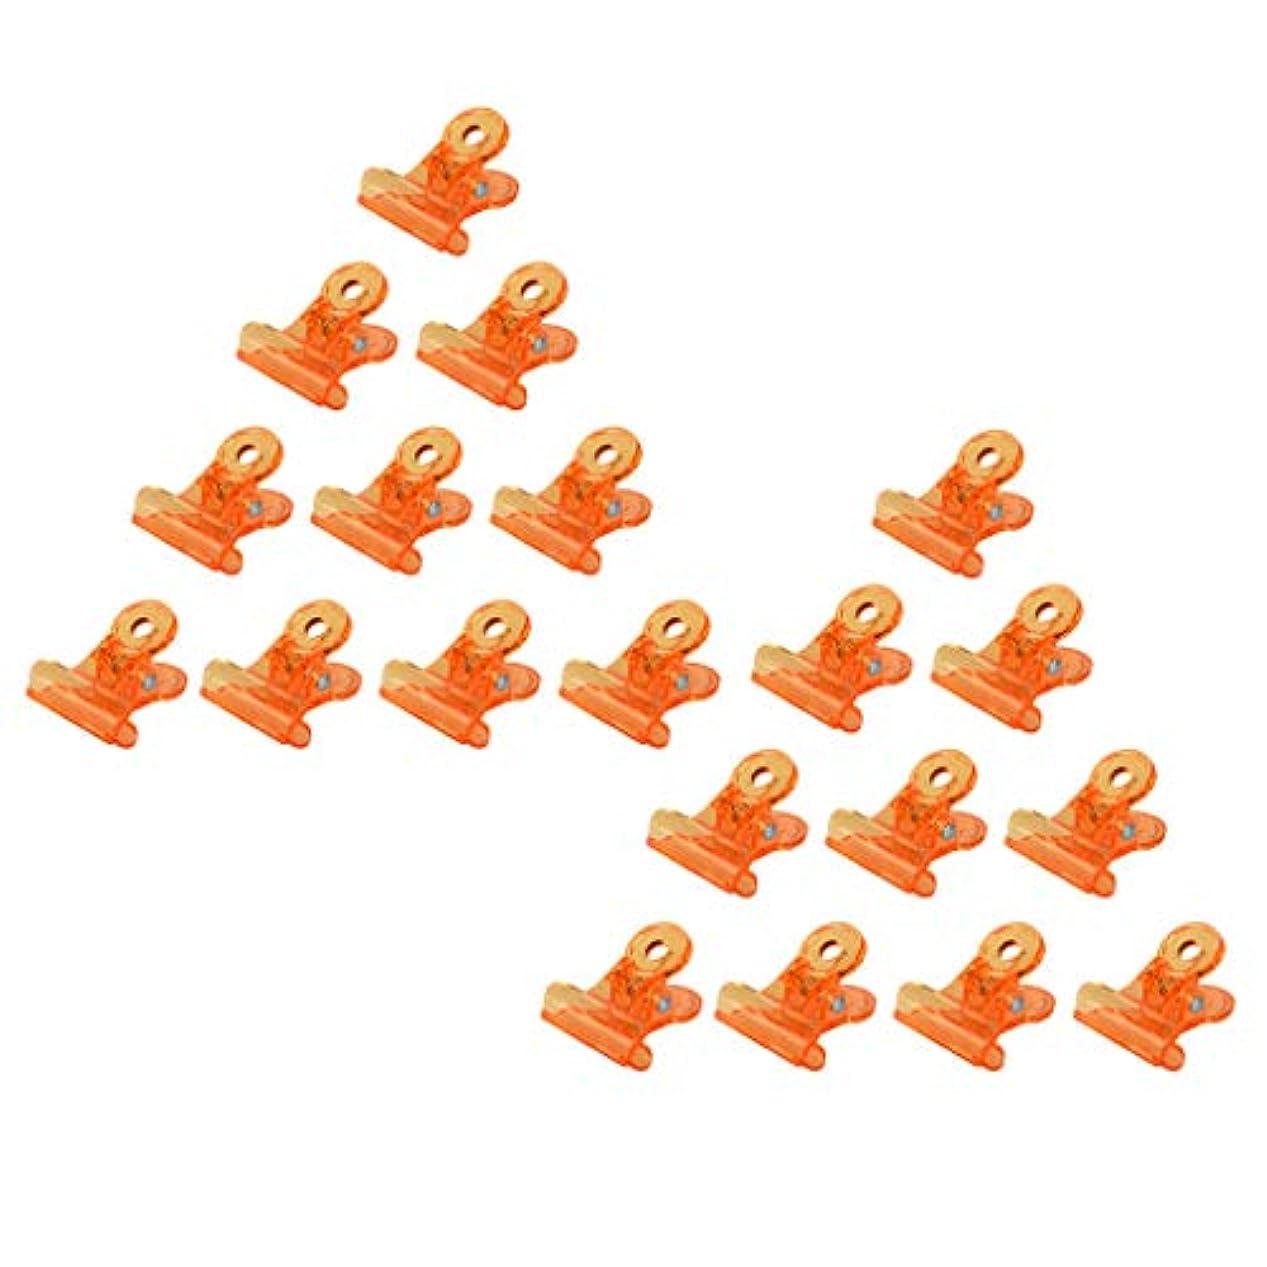 Toygogo 20xプレミアムオレンジソークオフジェルネイルアートラップクリップマニキュアリムーバークリップ